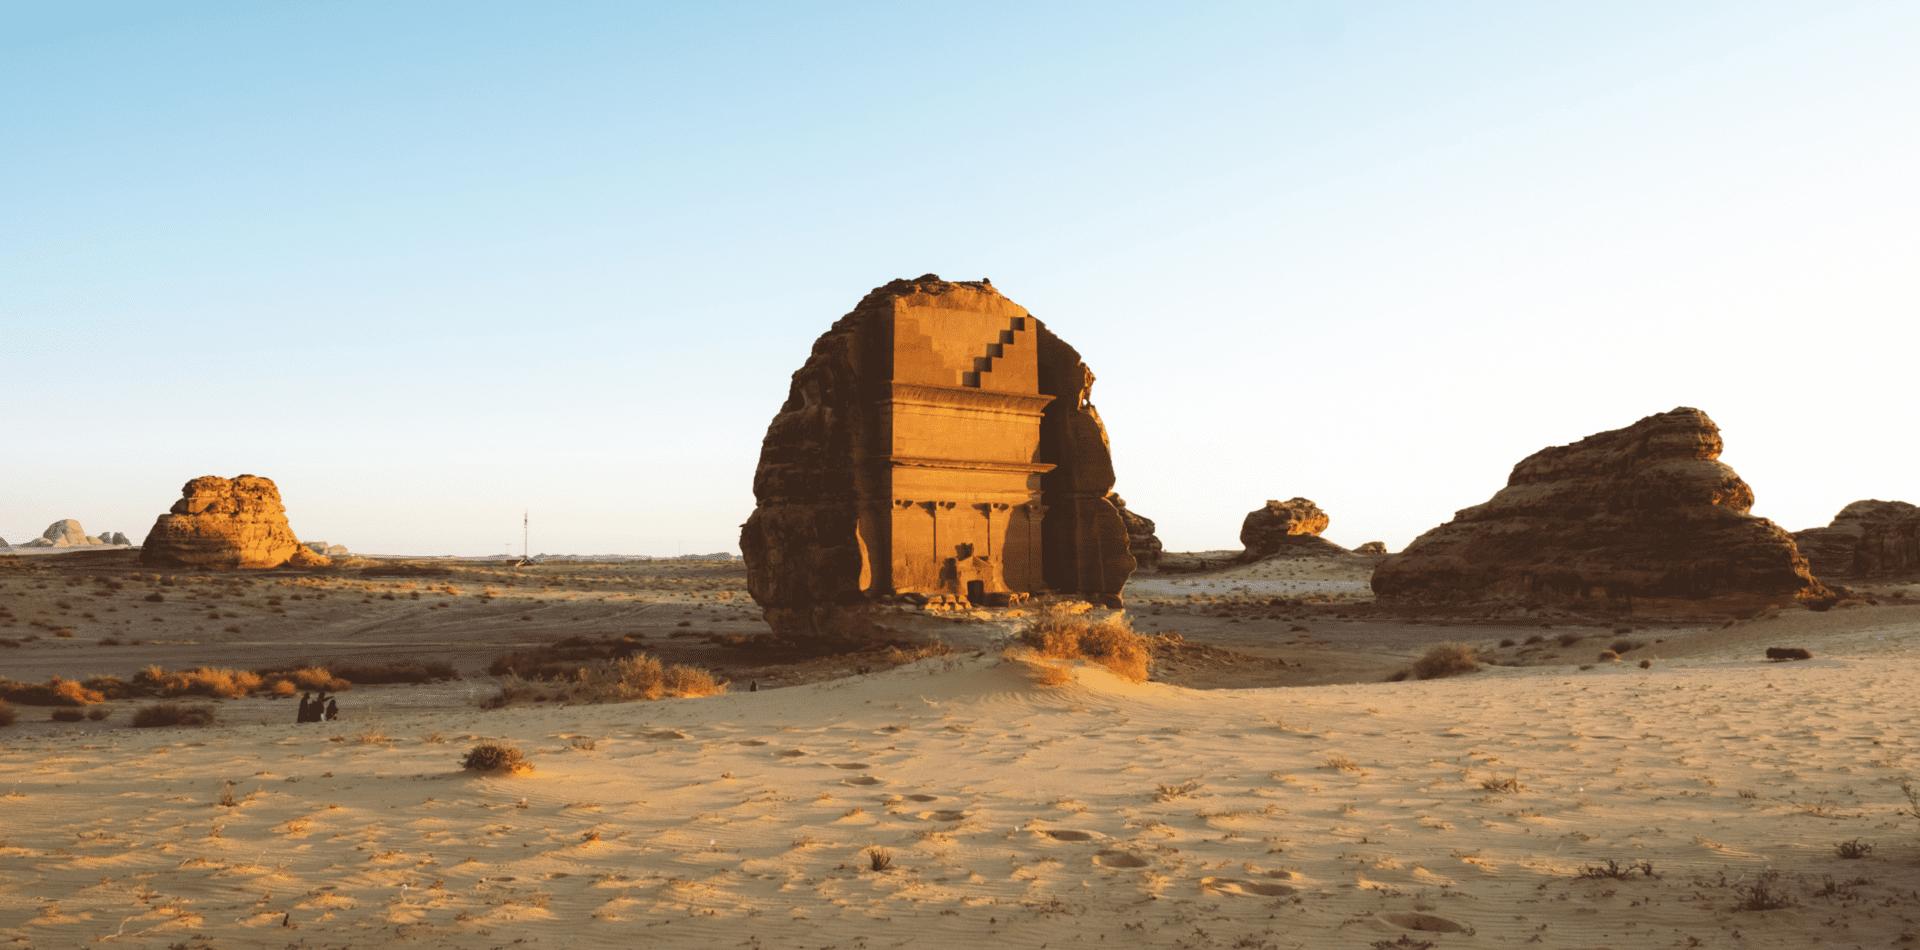 Hegra Sandstone Ruins in Al Ula, Saudi Arabia